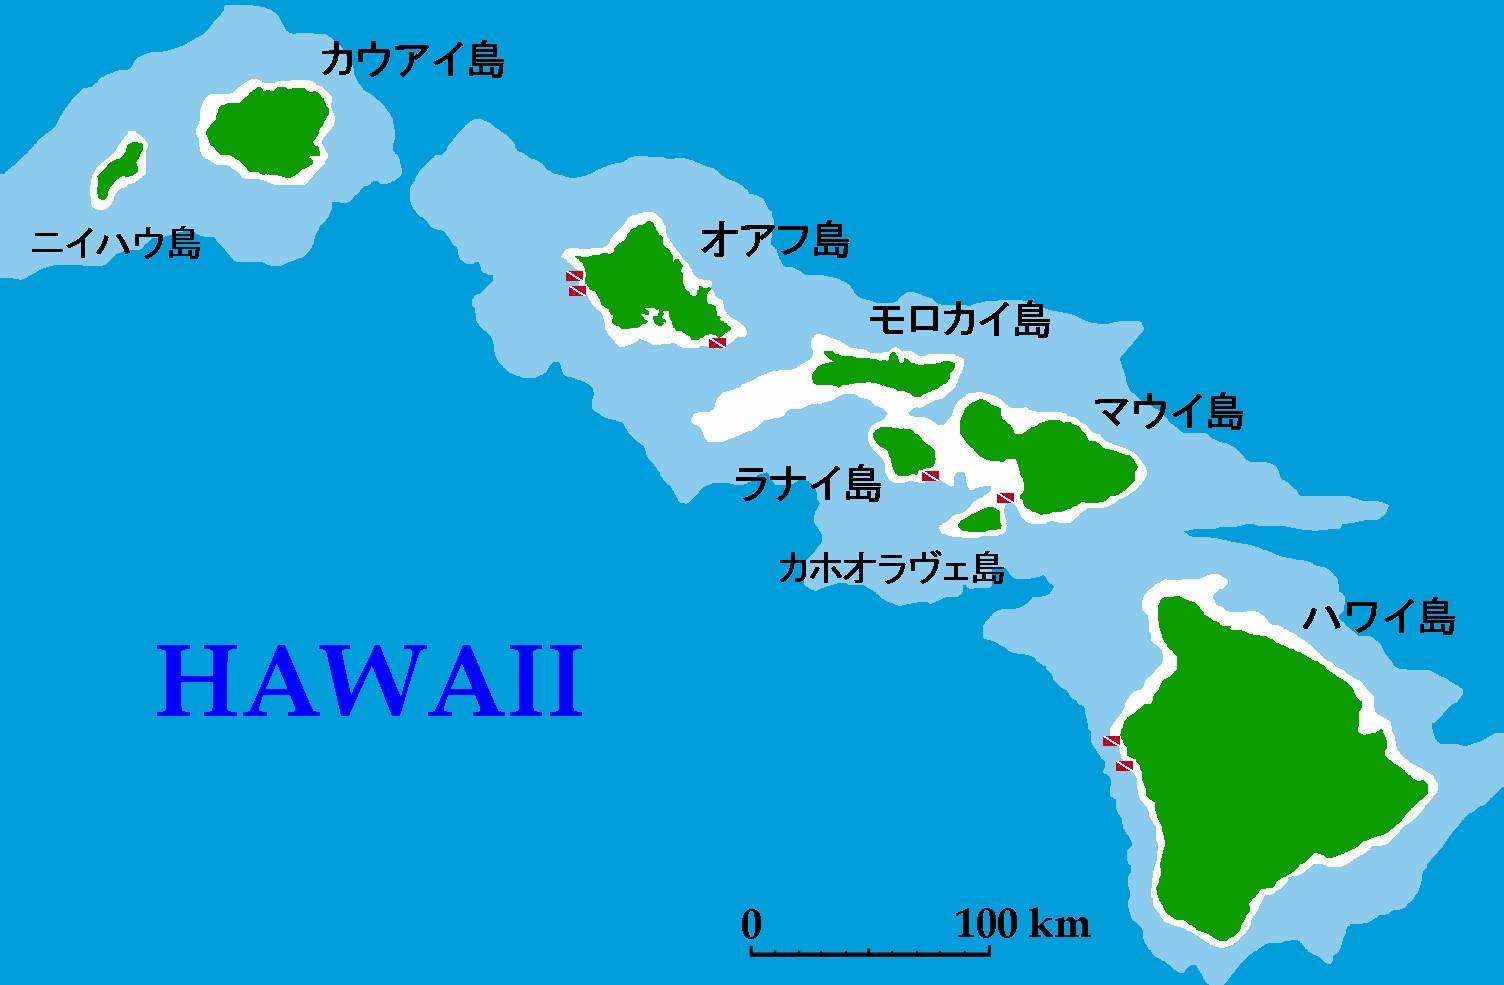 http://www5c.biglobe.ne.jp/~cassia/papafolder/HawaiiMap.files/HawaiiBase.jpg